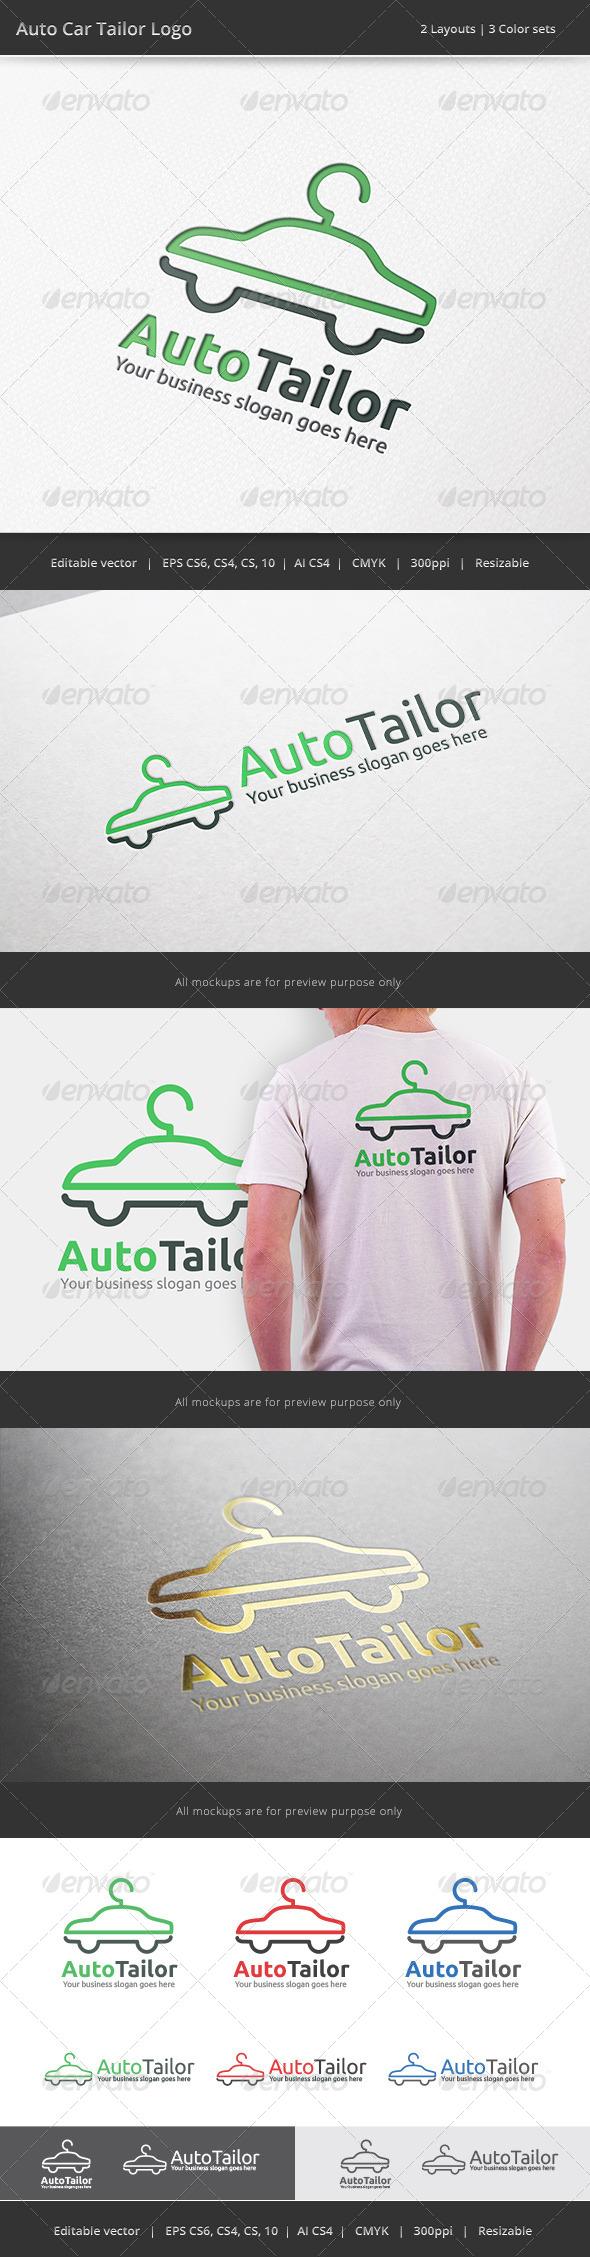 GraphicRiver Auto Car Tailor Logo 7410036